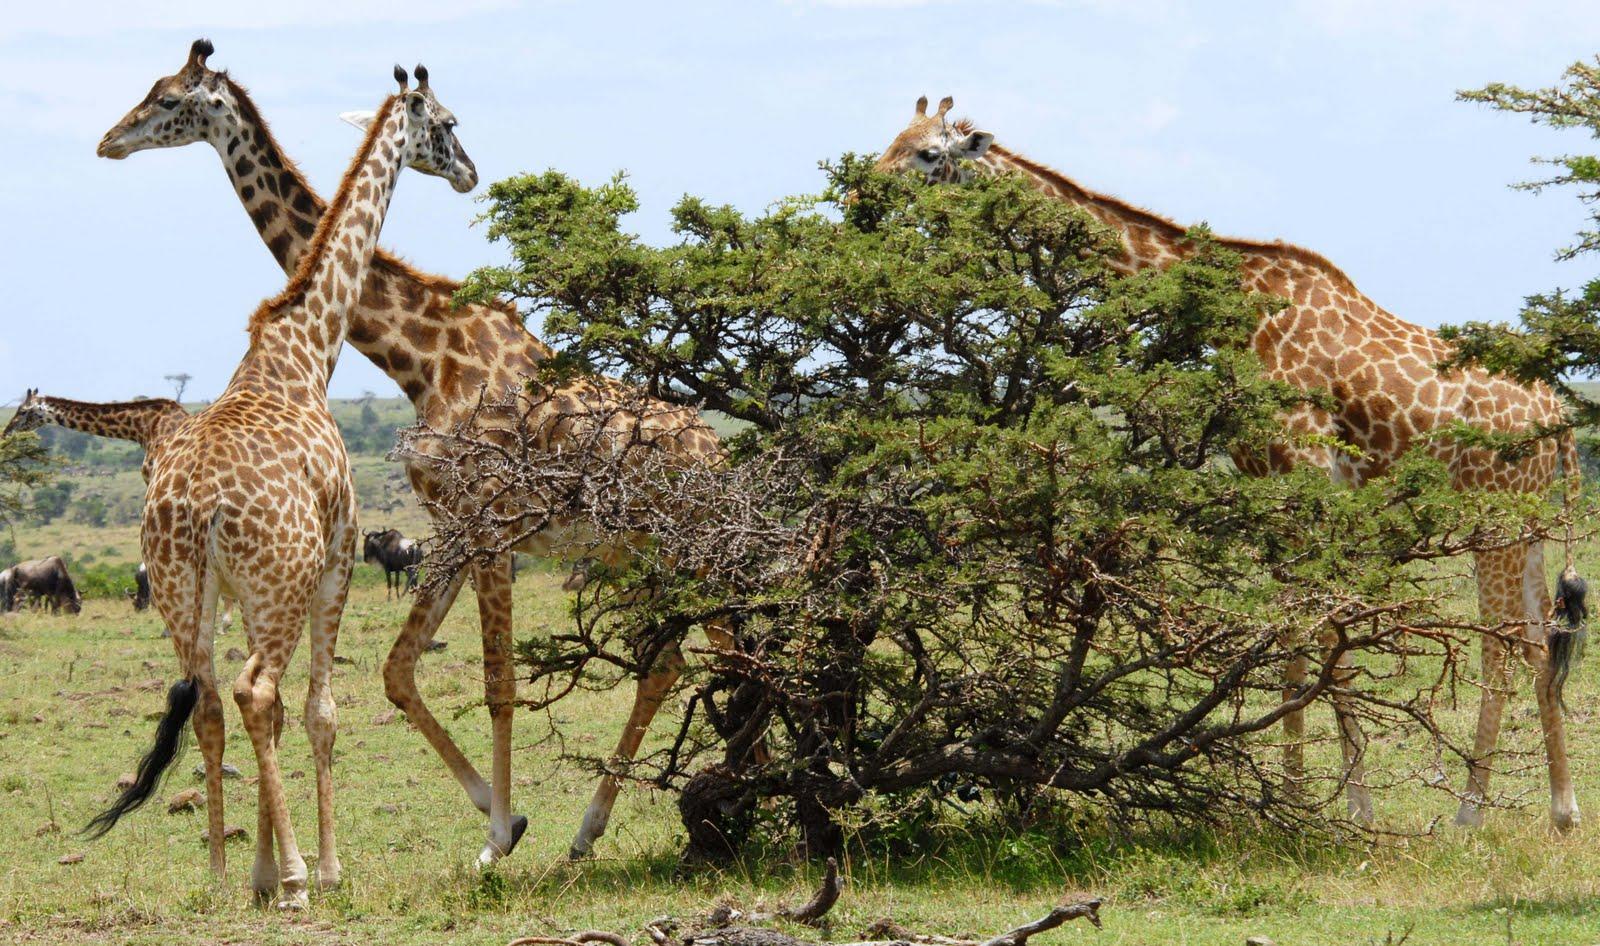 hvad spiser en giraf